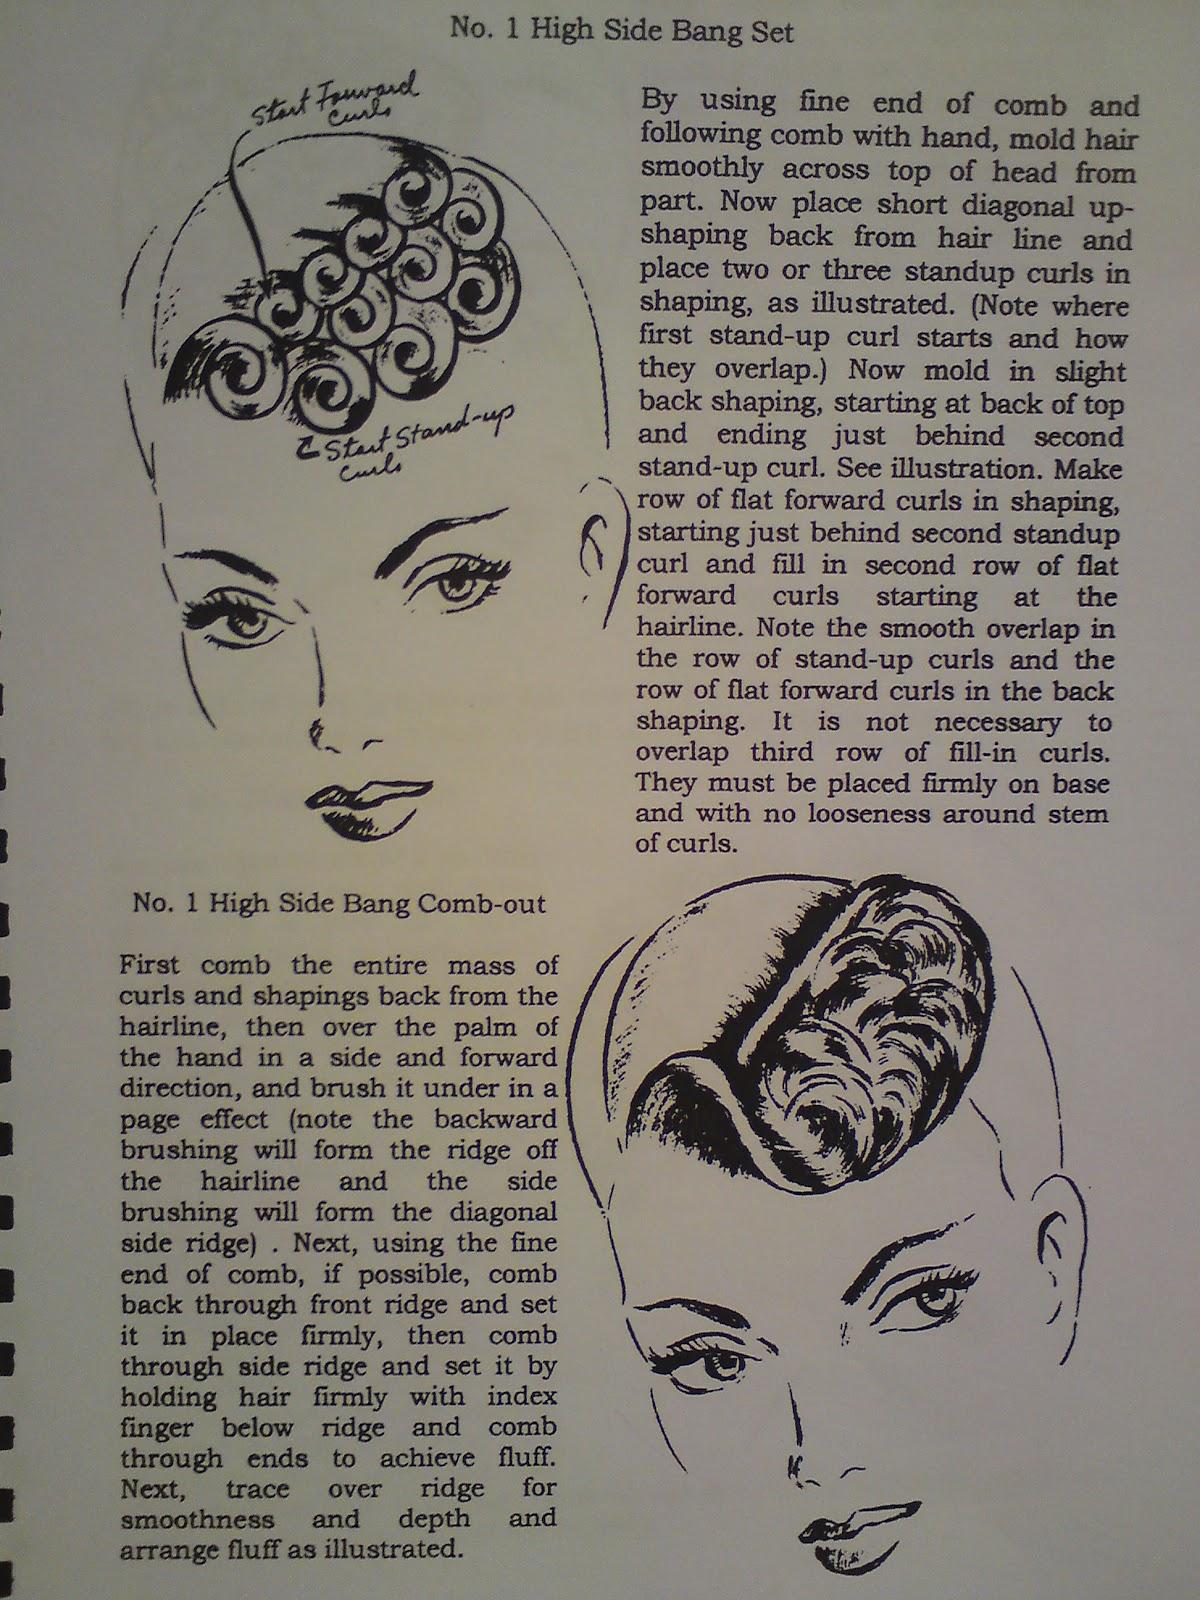 Pin Curl Diagram 2001 Dodge Caravan Starter Wiring Up Life Hair Setting And Pincurls